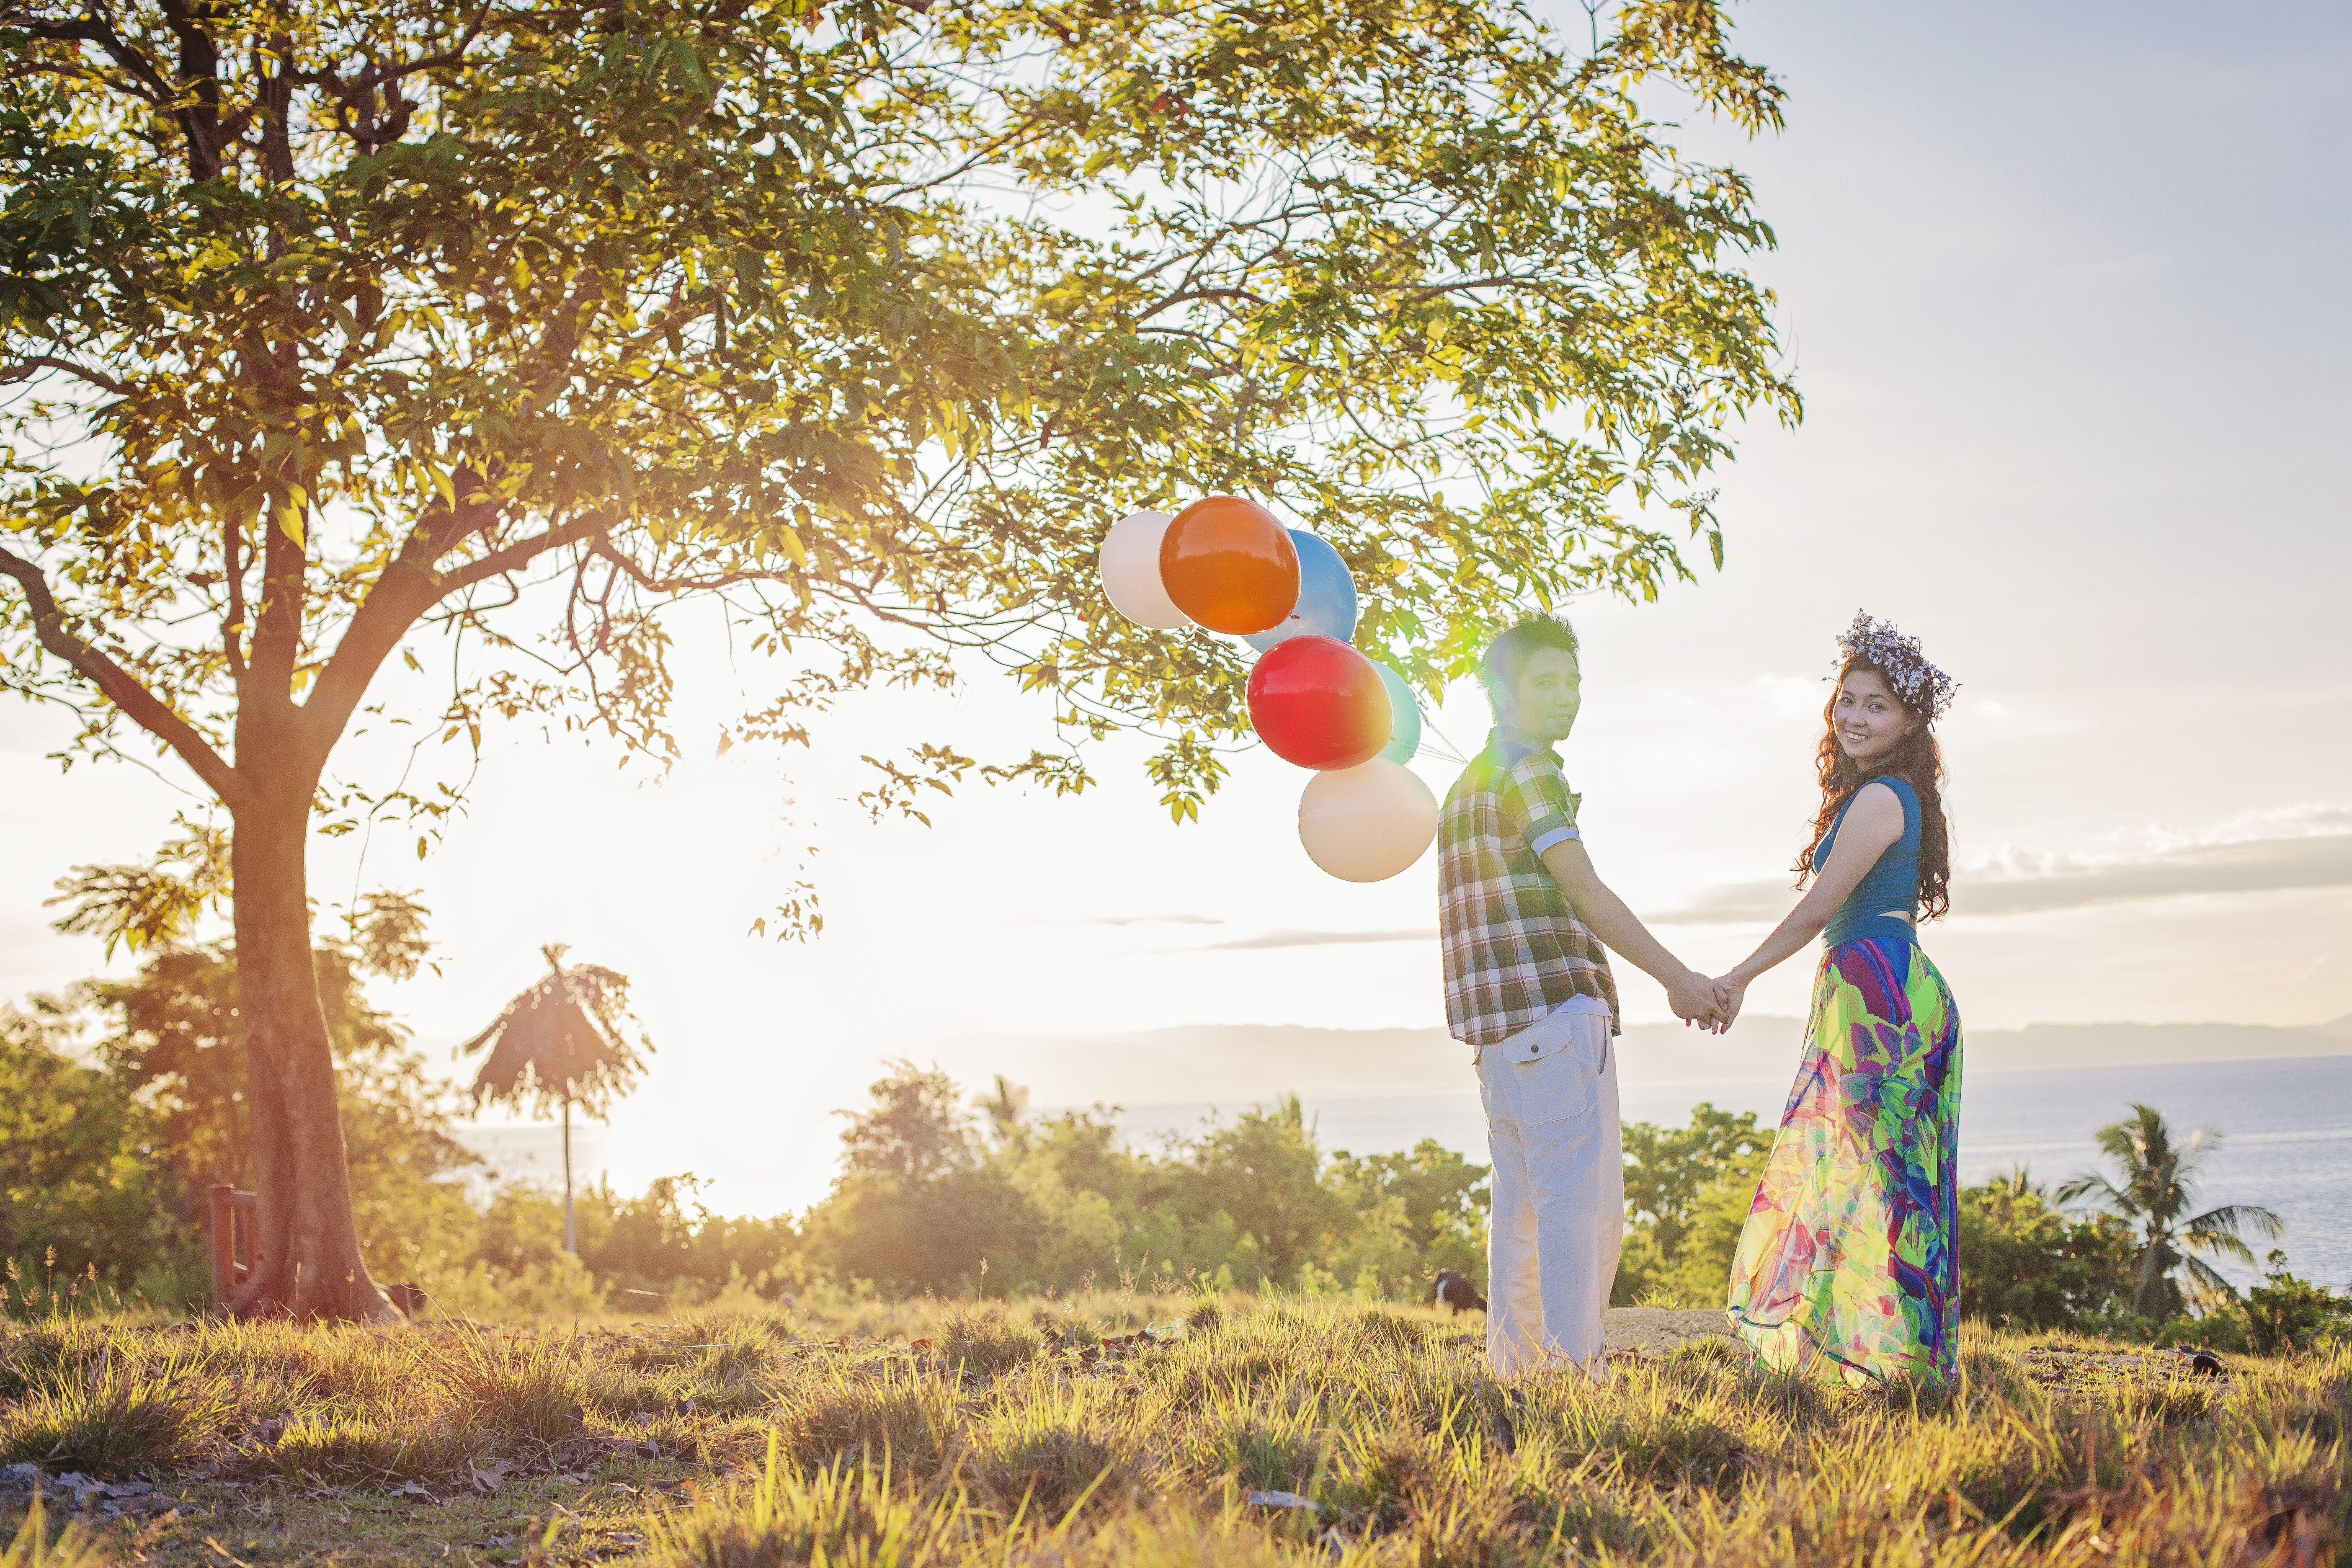 nature themed prenup | Pre-Nup | Pinterest | Weddings